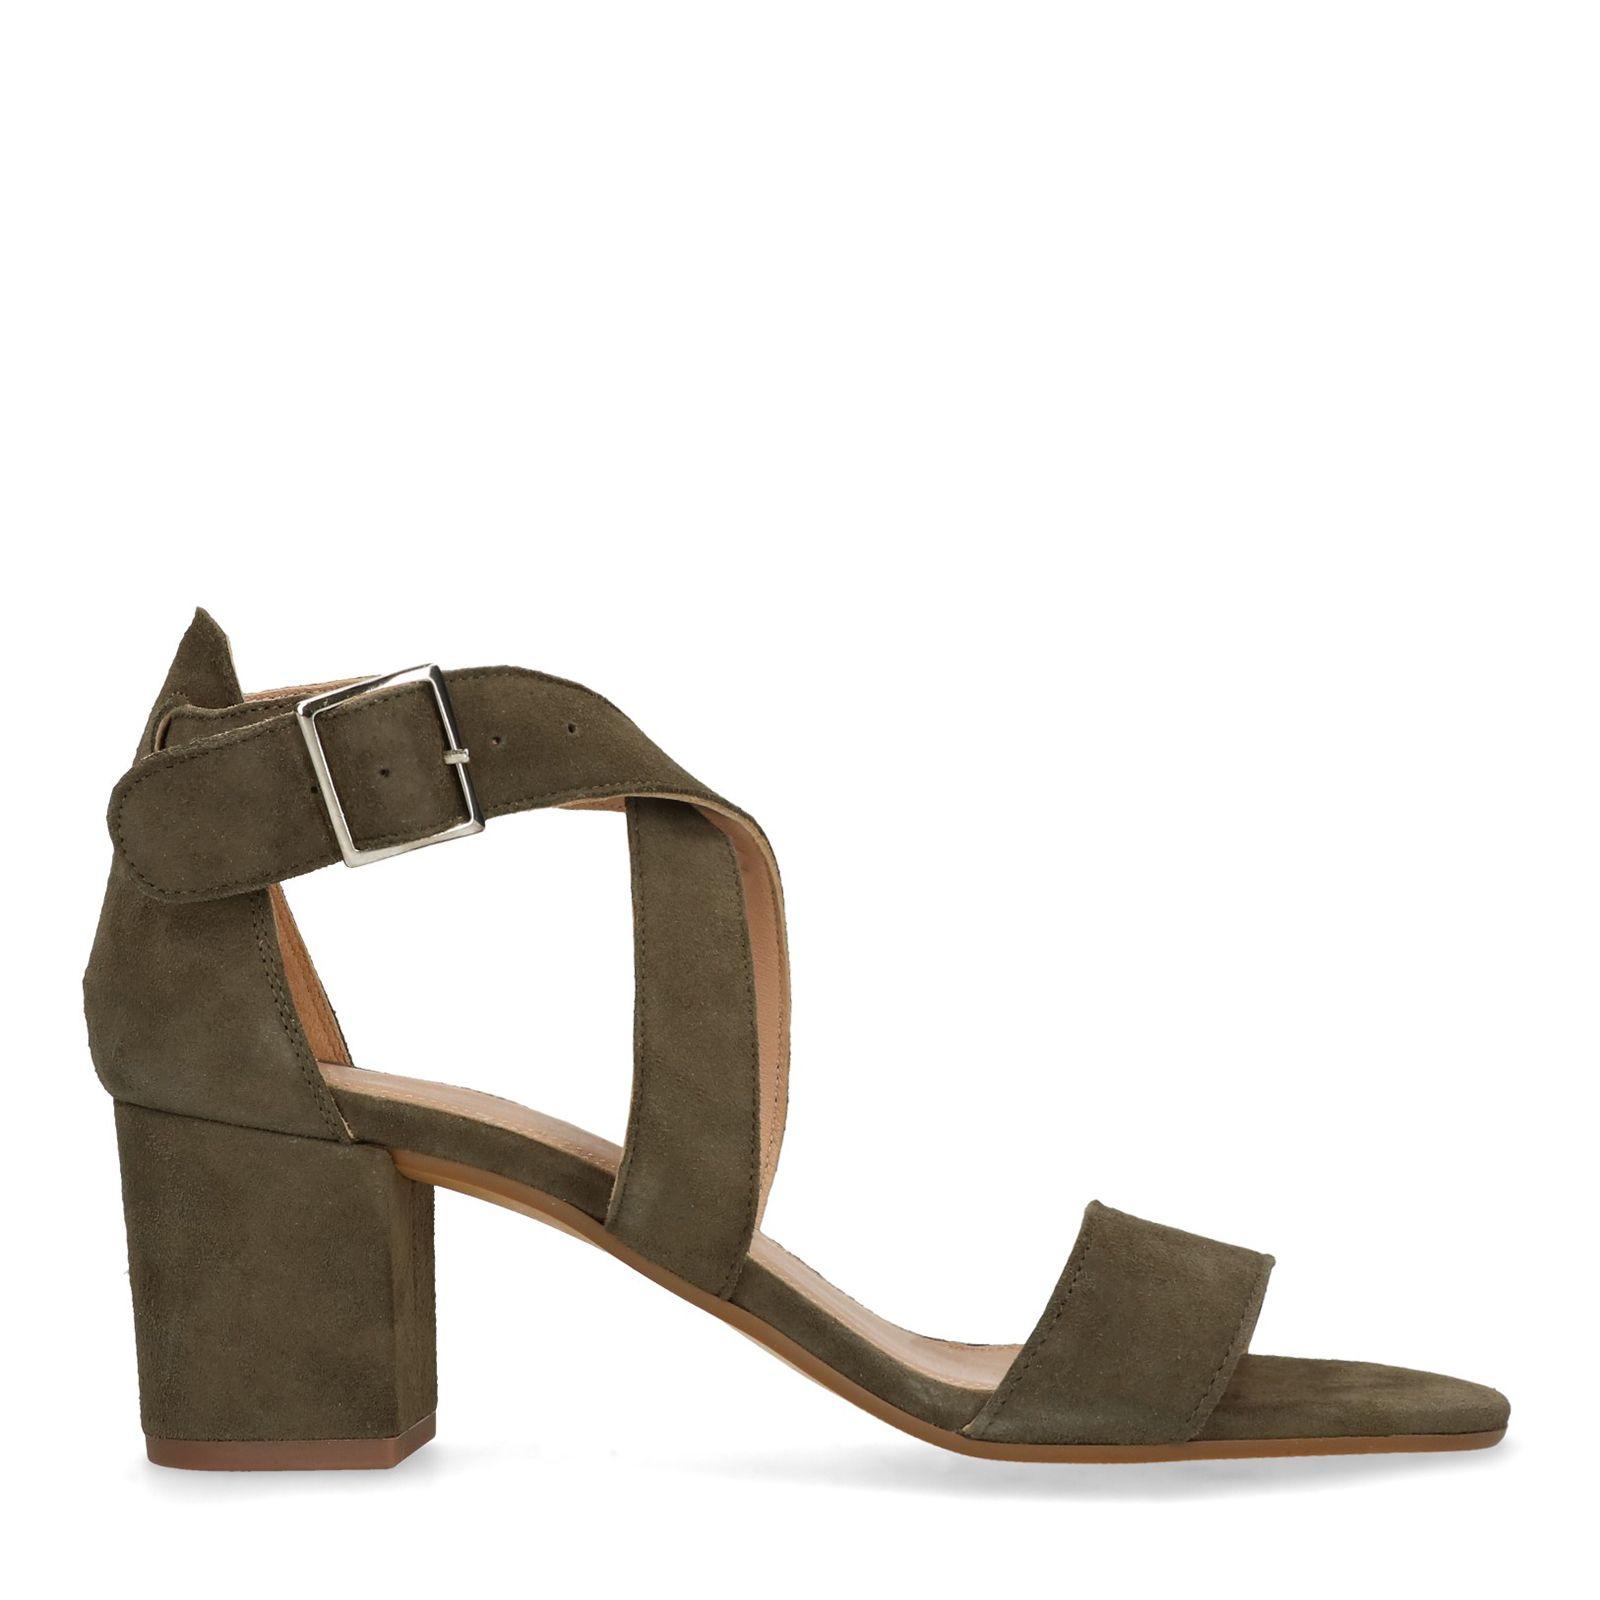 ad8553474 Groene sandalen met hak - Dames   MANFIELD